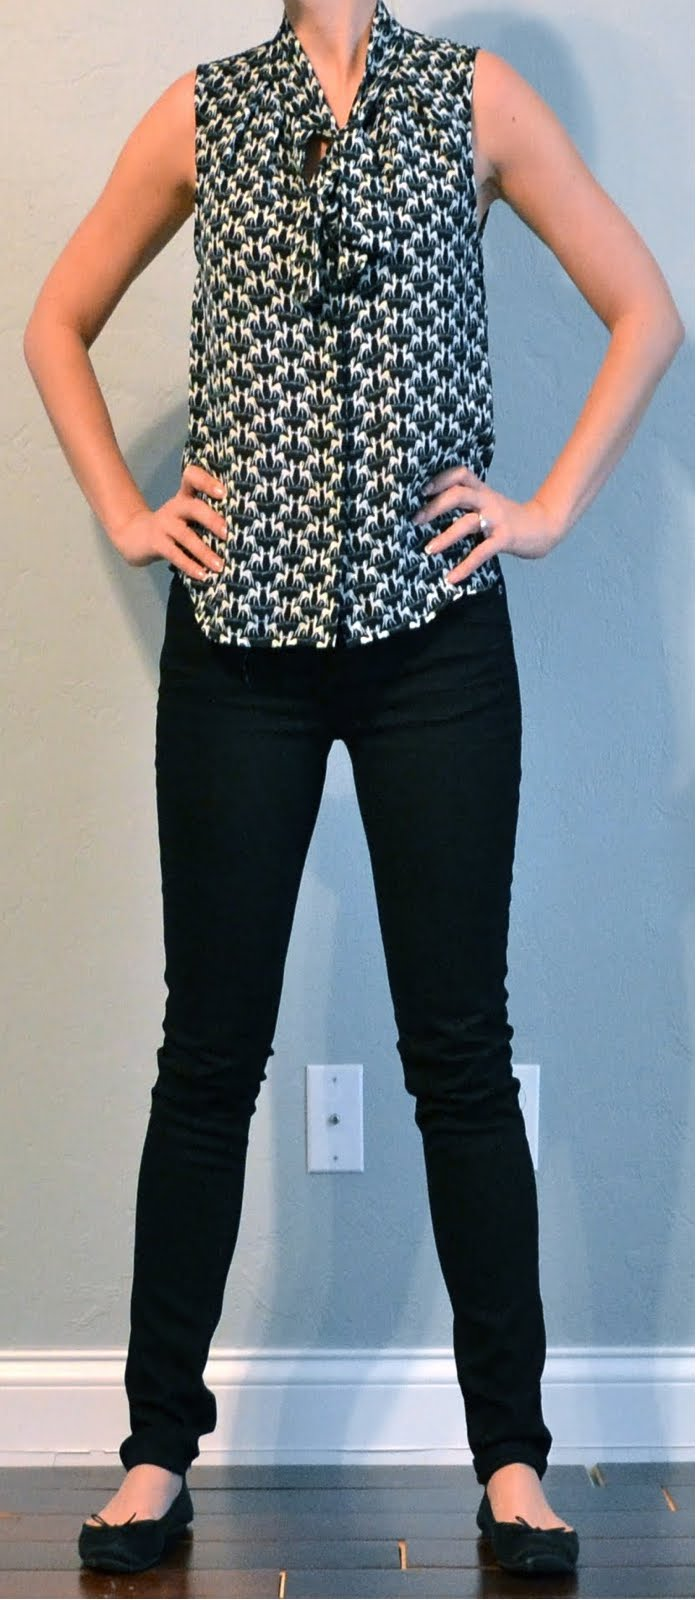 Black Skinny Jeans And Flats Black Skinny Jeans Target